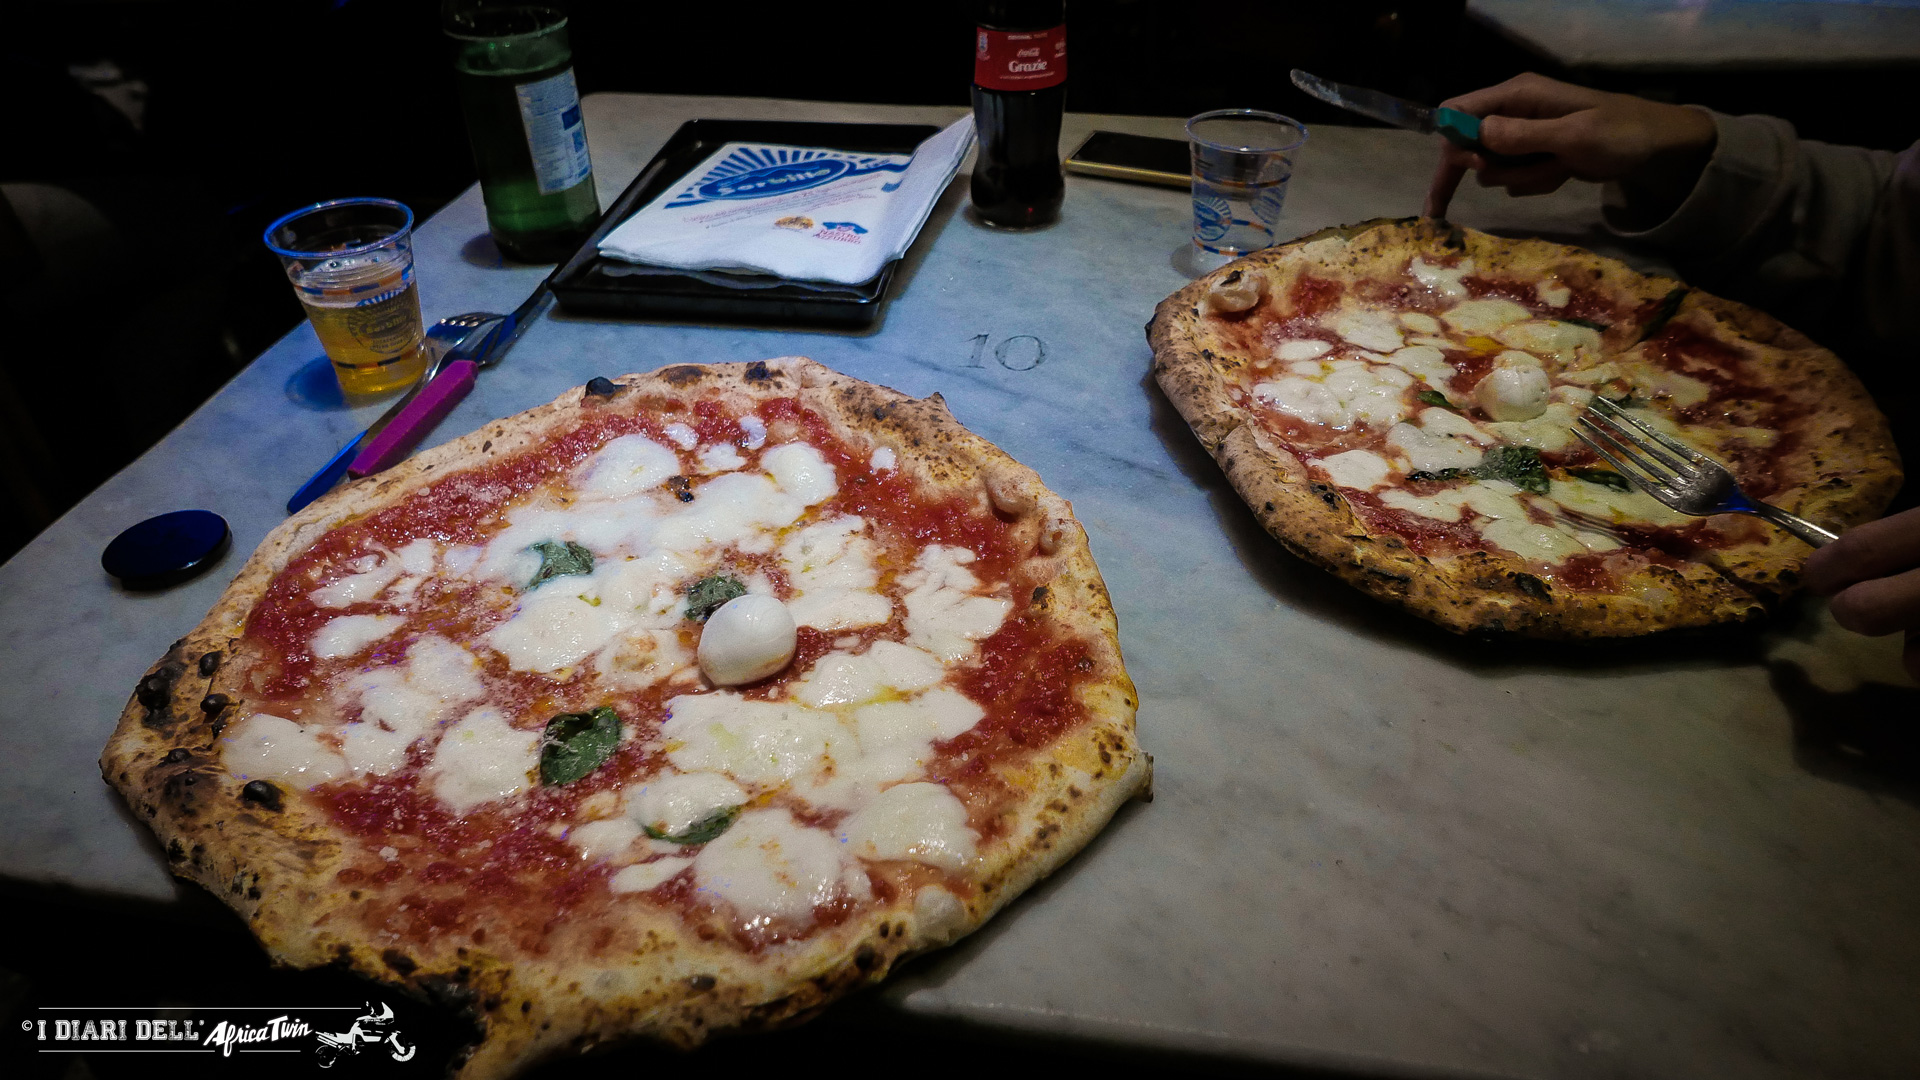 Le nostre pizze con mozzarella di bufala DOP